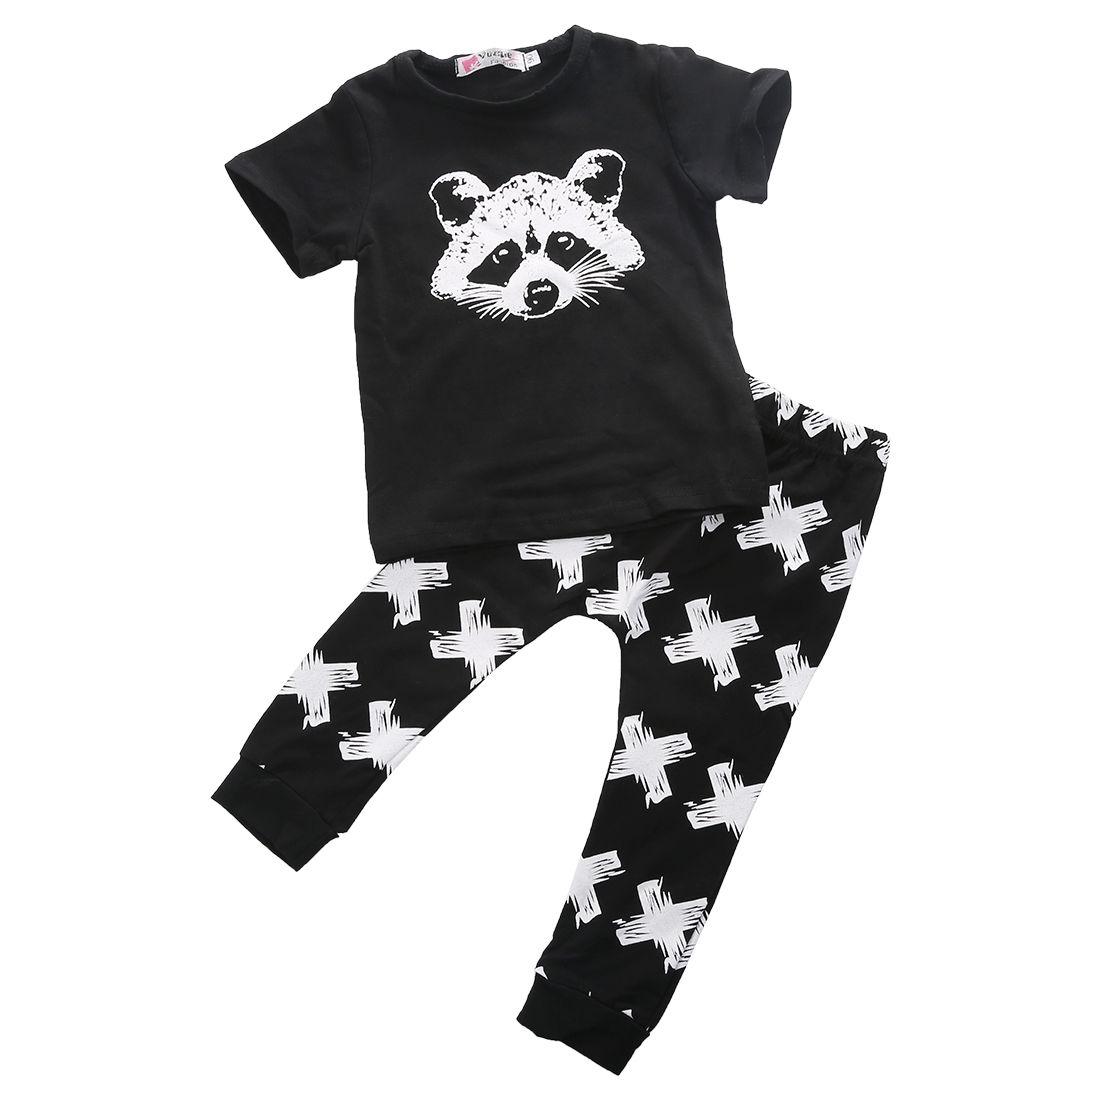 0-24 M Neugeborenen Baby Jungen Kleidung Kurzarm Fuchs Baumwolle T-shirt Tops Kreuz Drucken Lange Hose 2 Pcs Baby Kleidung Set